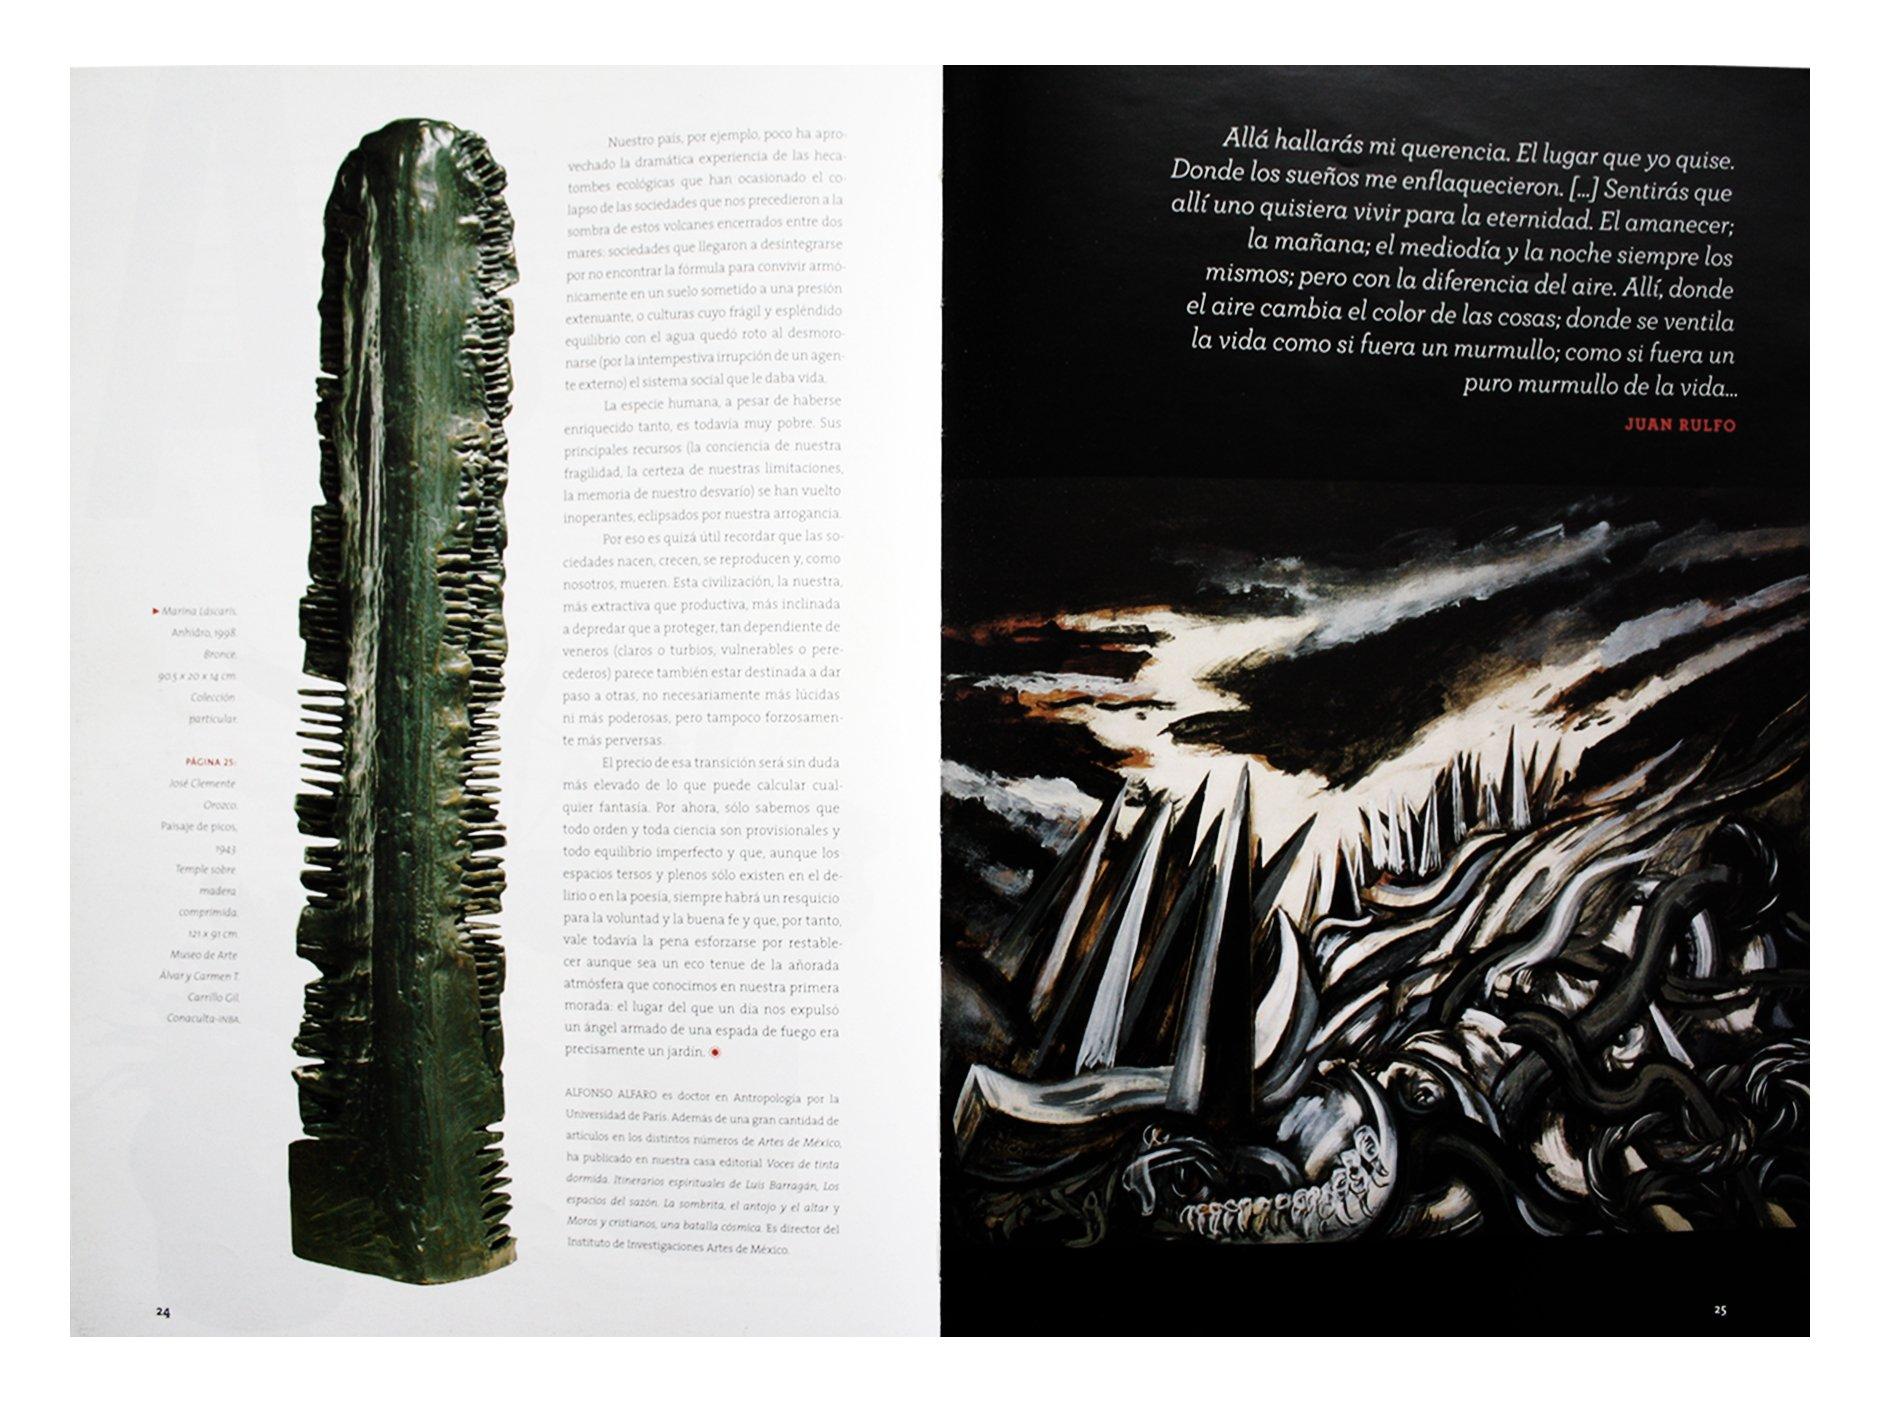 Arte y cambio climatico (Art and Climate Change), Artes de Mexico # 99 (Bilingual edition: Spanish/English) (Spanish Edition): Jose Emilio Pacheco, ...